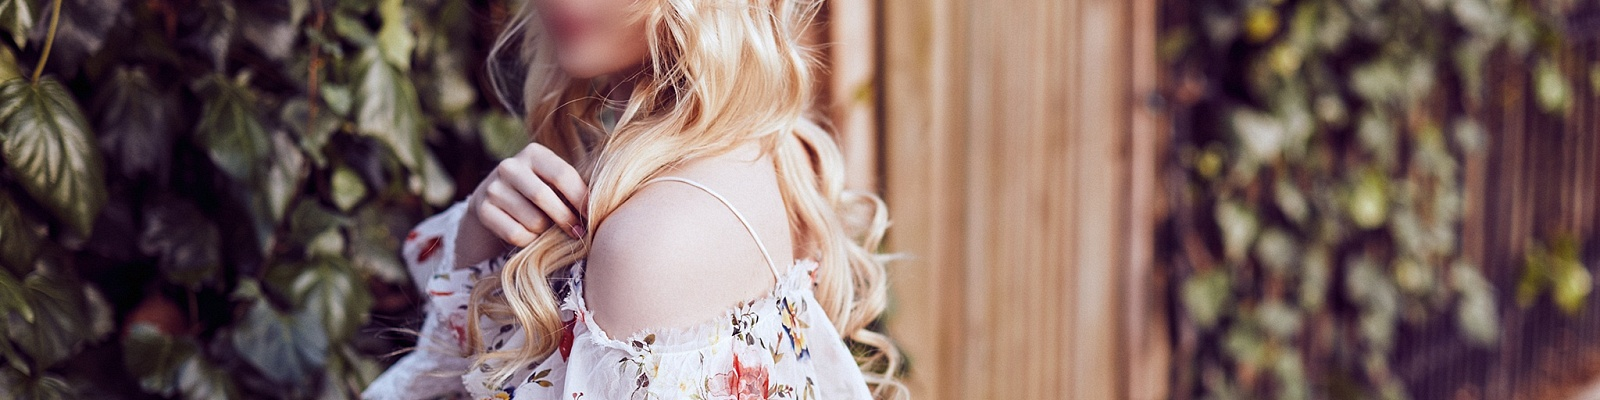 Nadia Nielsen's Cover Photo